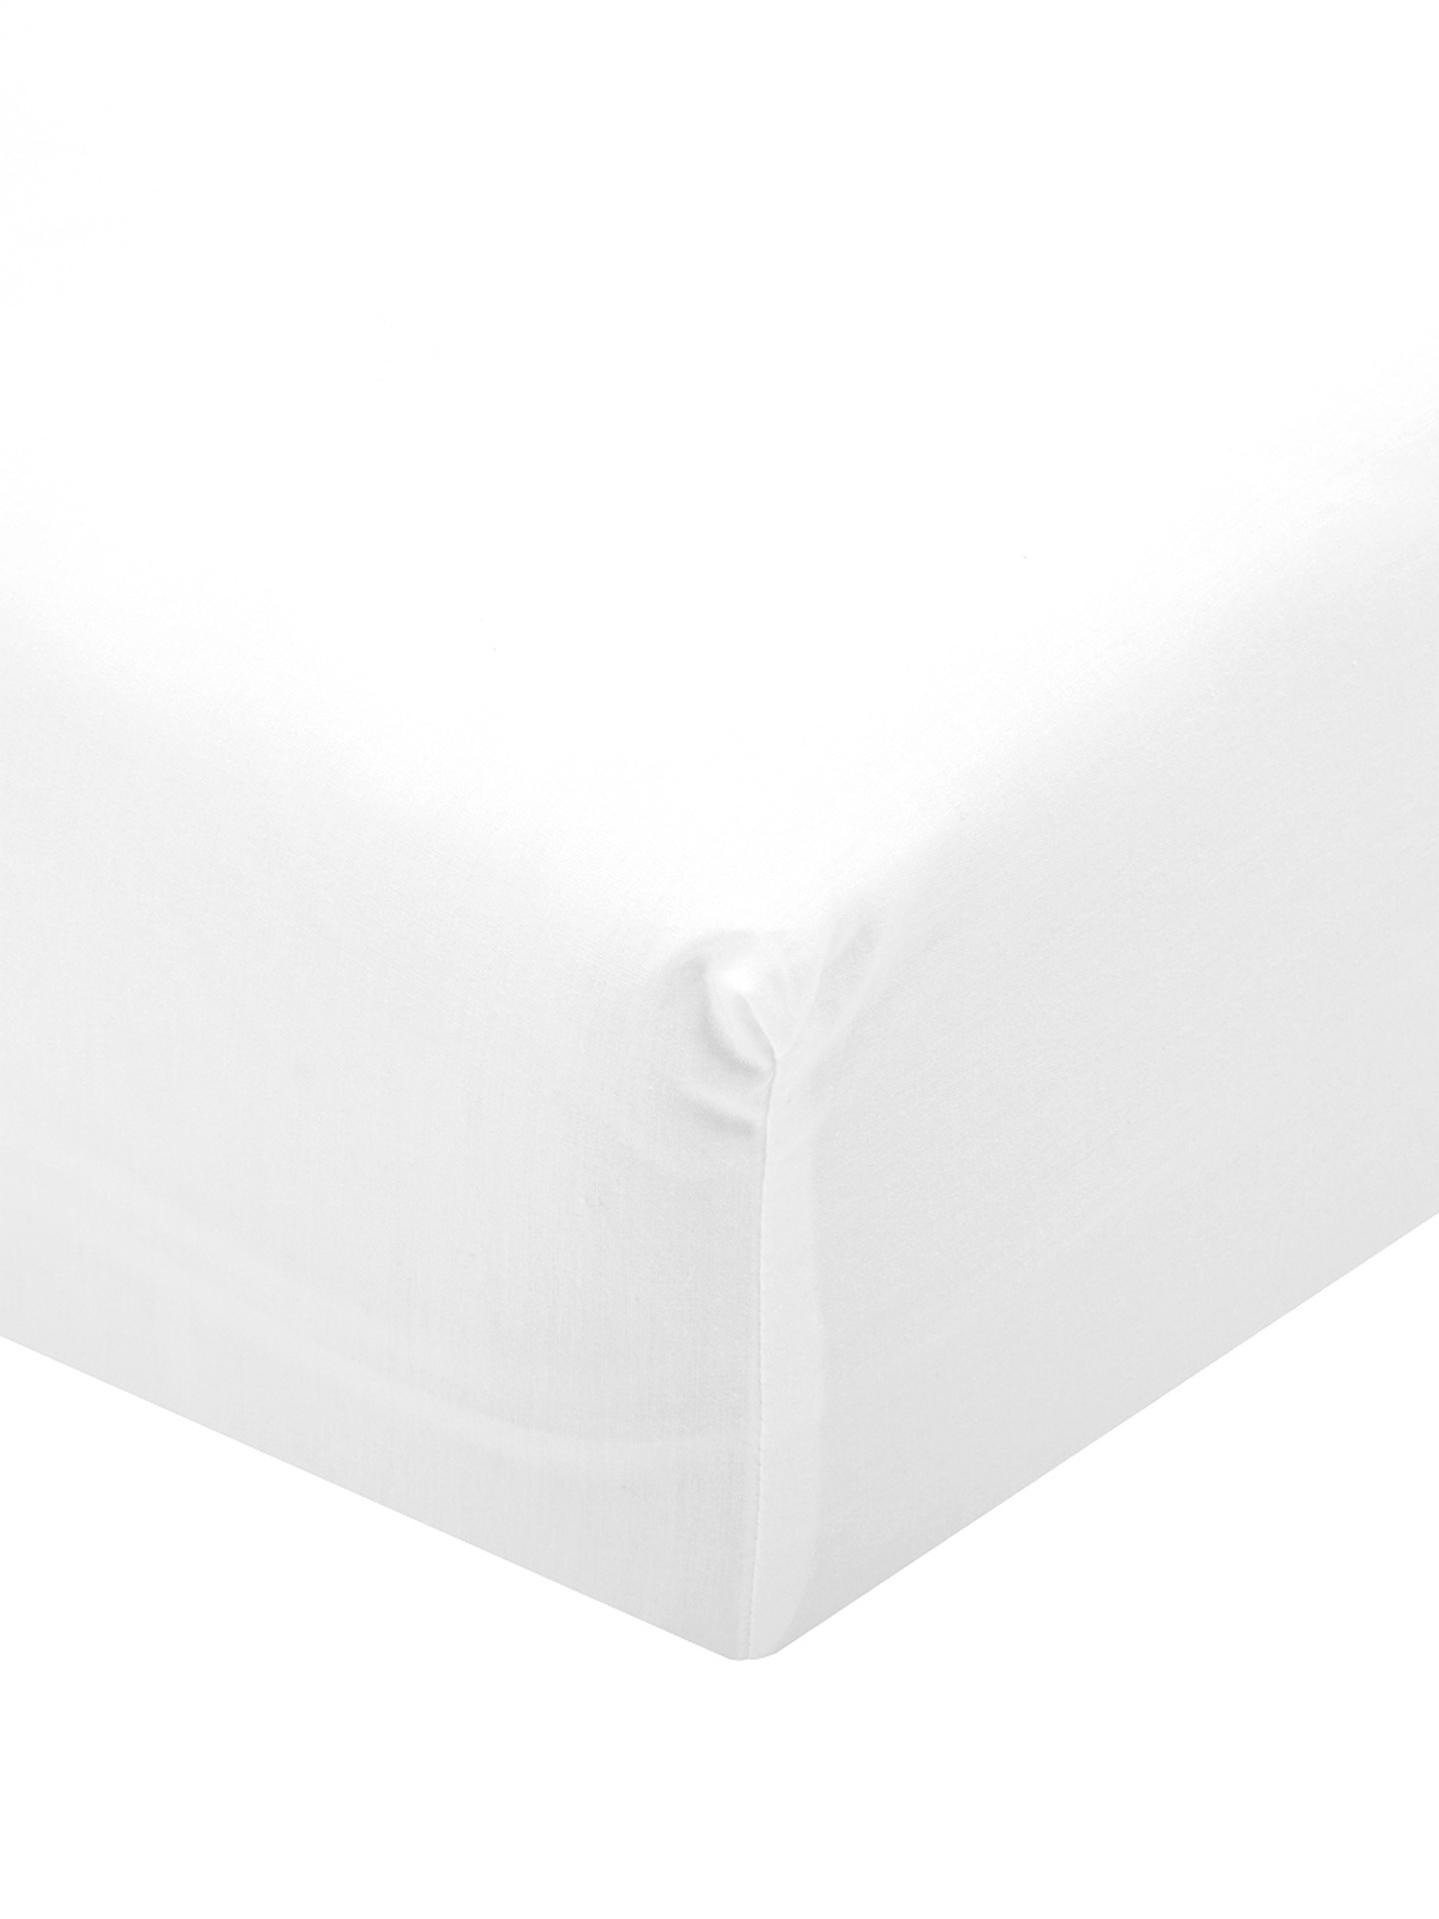 Perkal hoeslaken Elsie, Weeftechniek: perkal, Wit, 90 x 200 cm